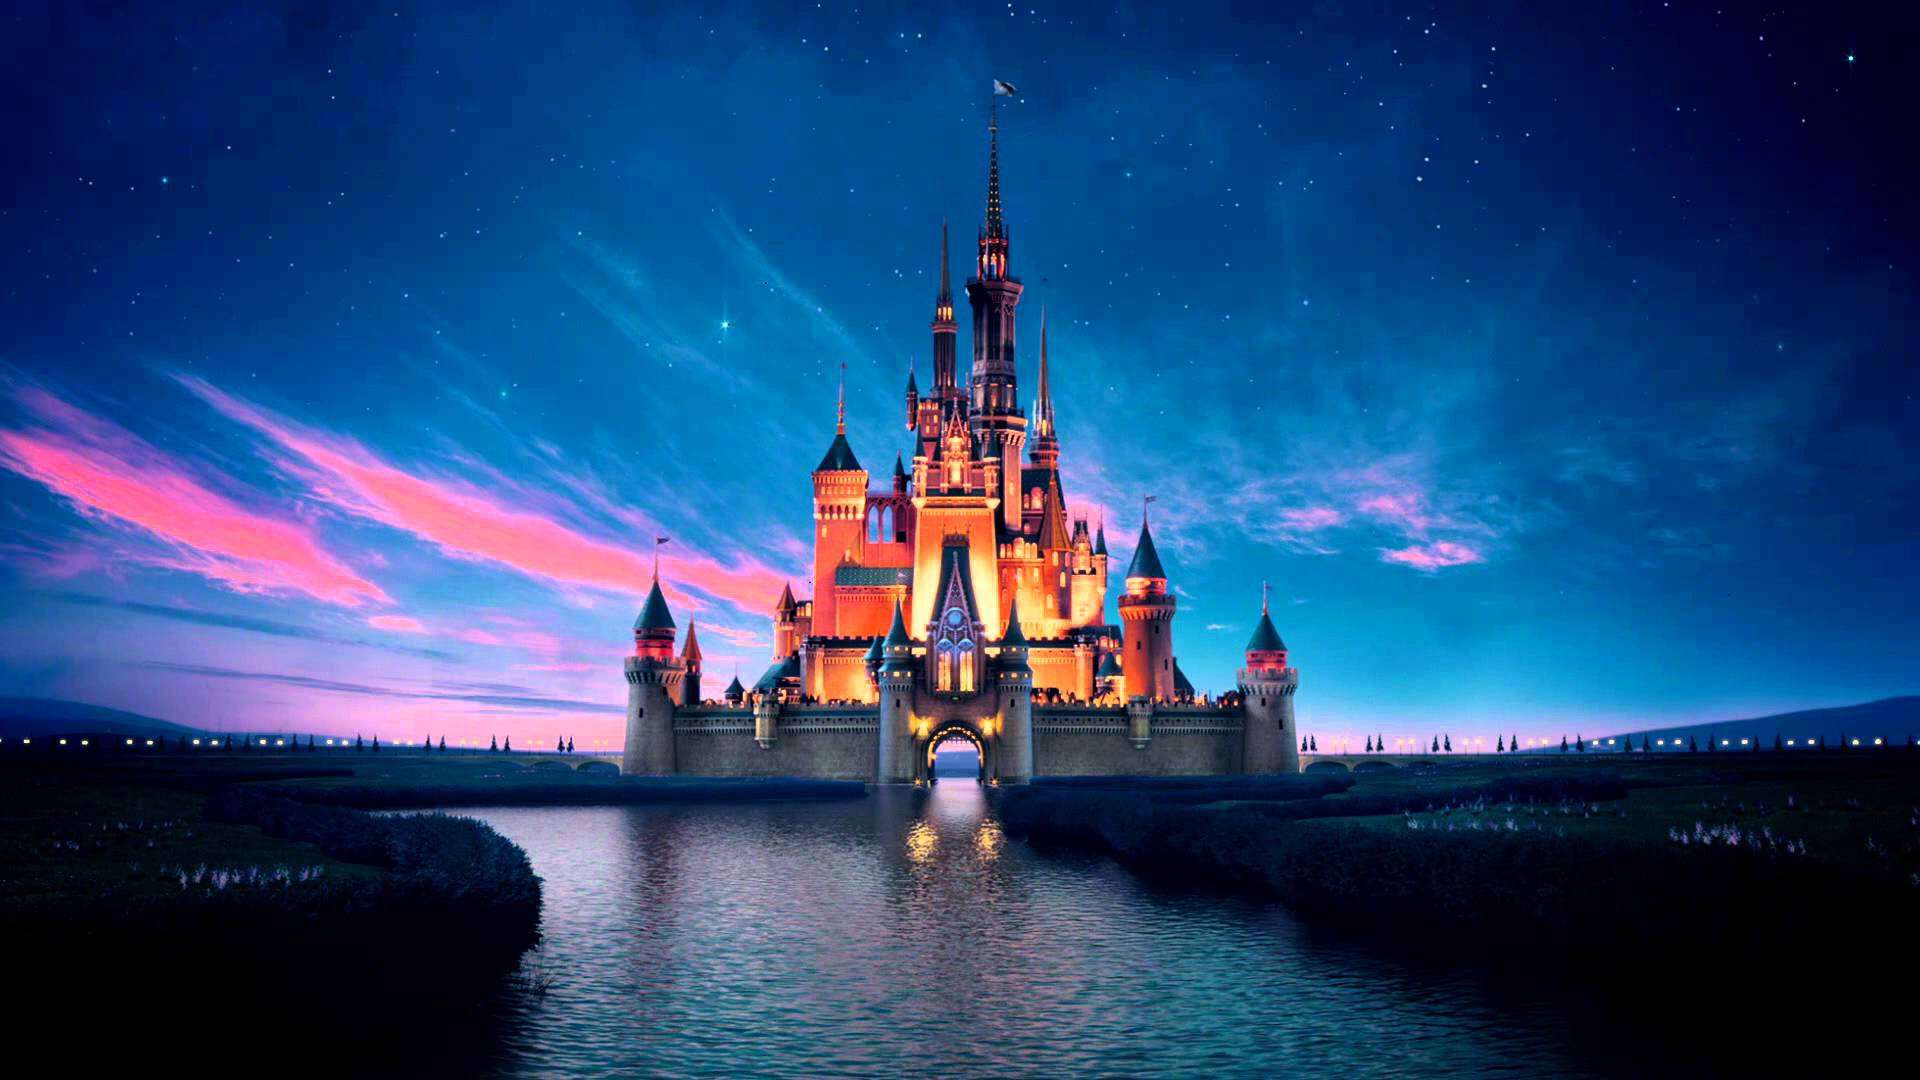 Walt Disney Studios The Castle   Logo 2012 HD 1080p 1920x1080